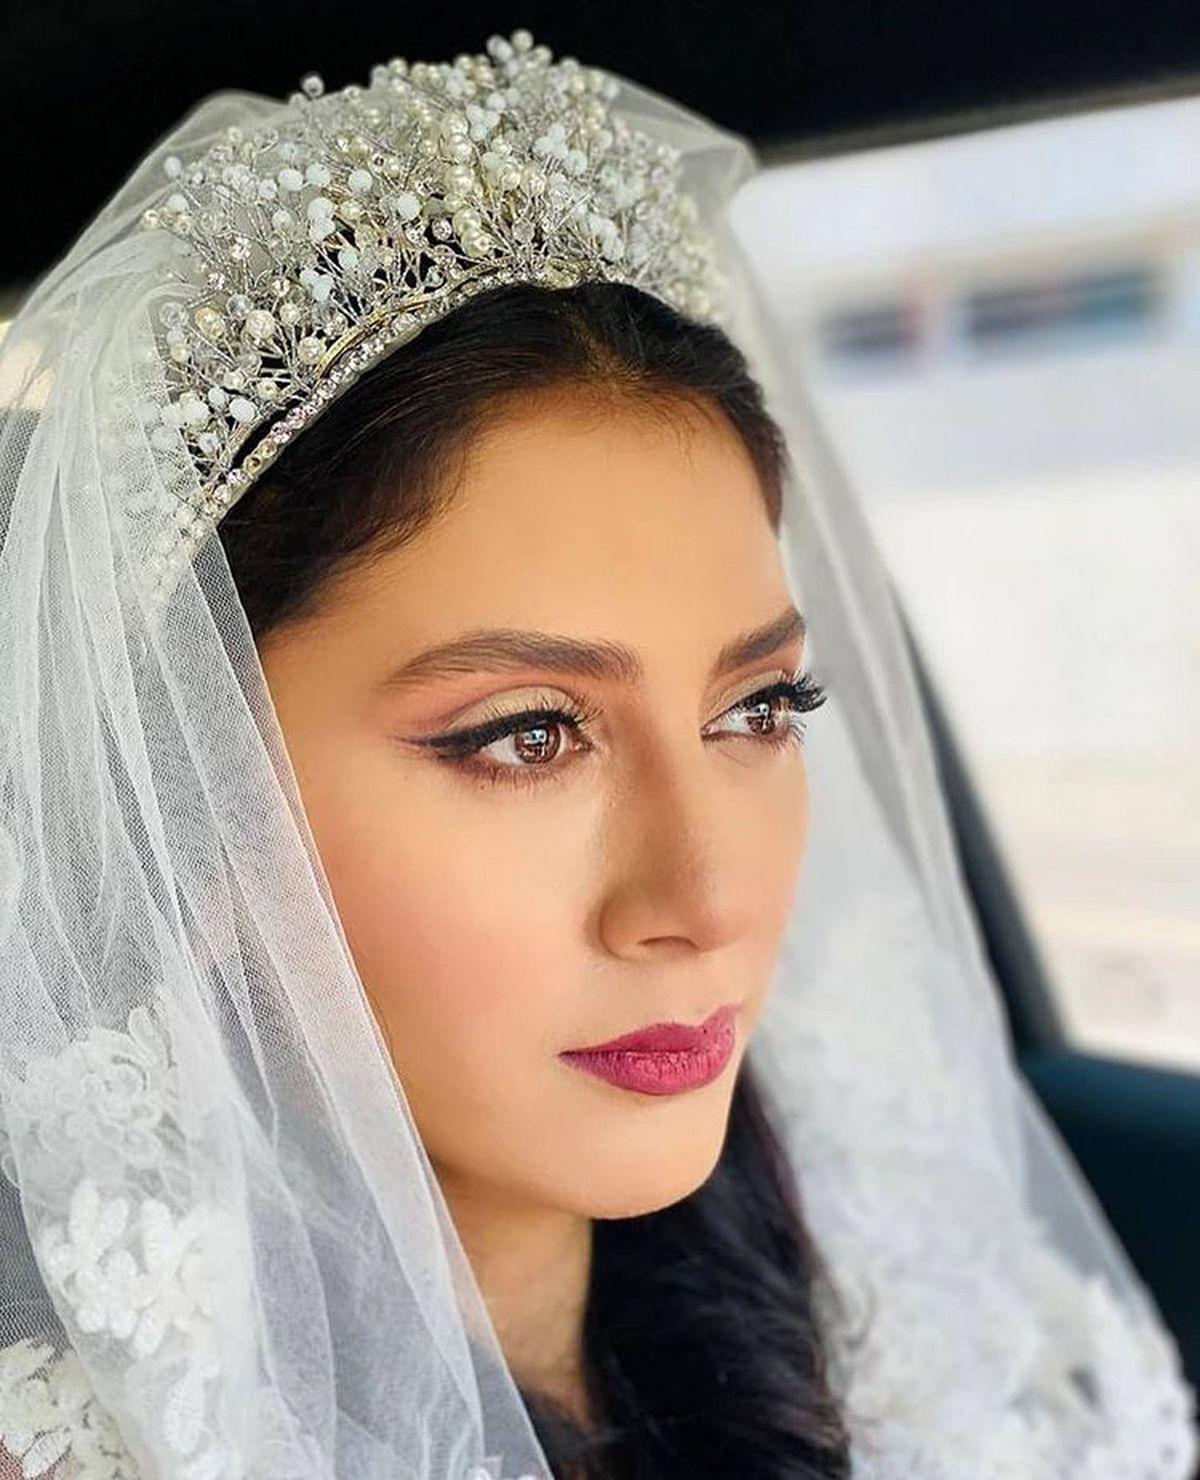 مونا فرجاد ازدواج کرد   عکس مونا فرجاد در لباس عروس